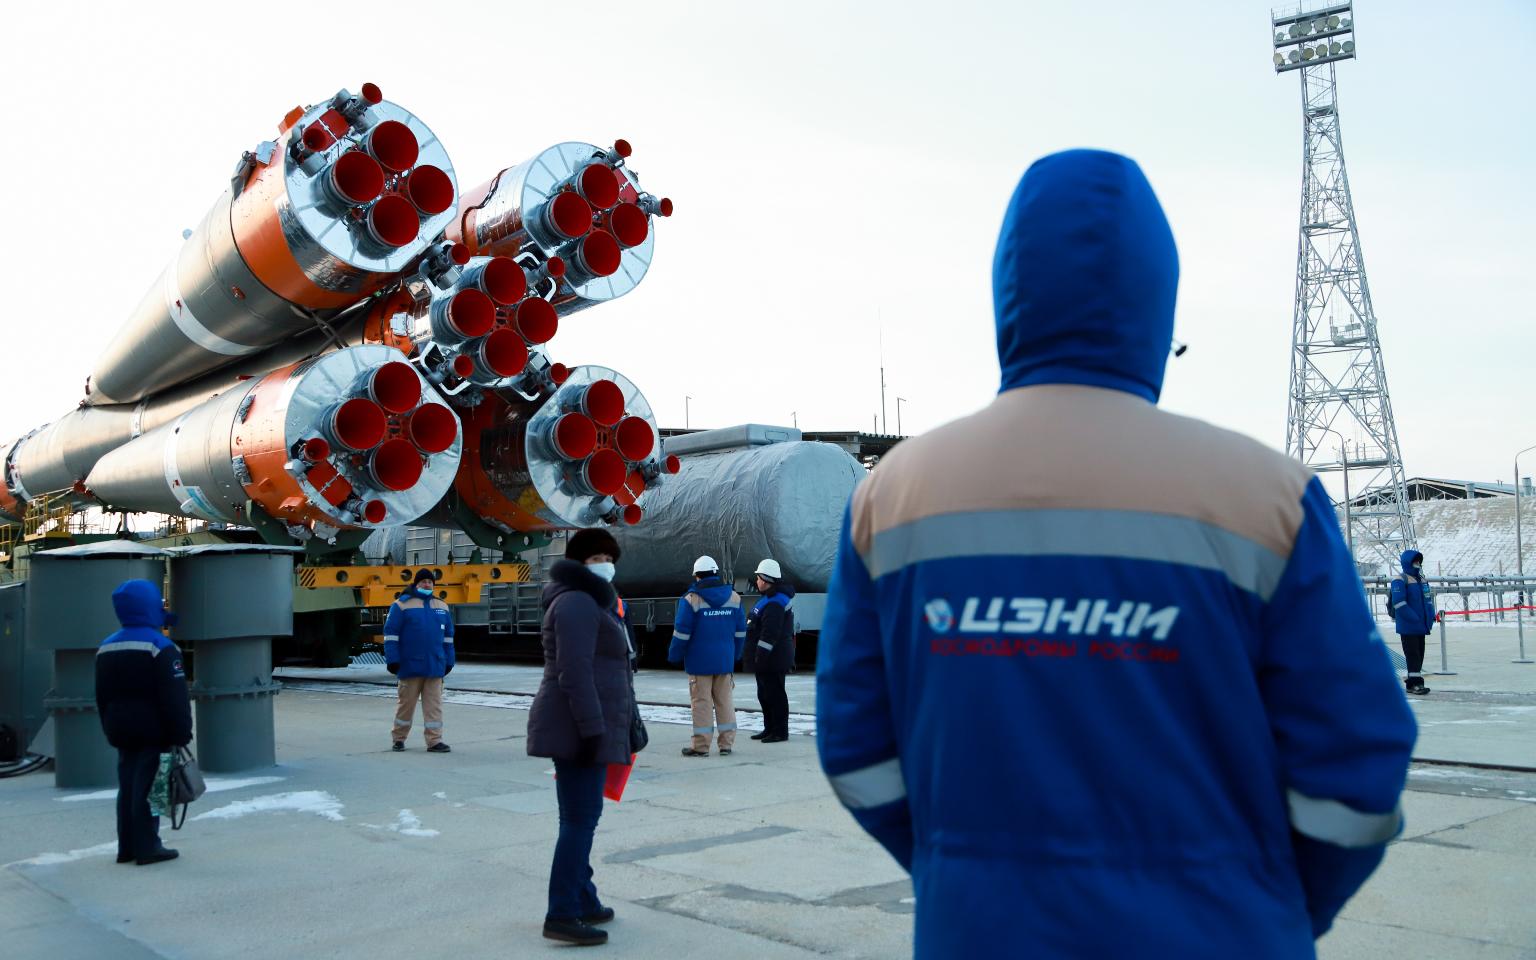 Фото: Пресс-служба Роскосмоса / РИА Новости